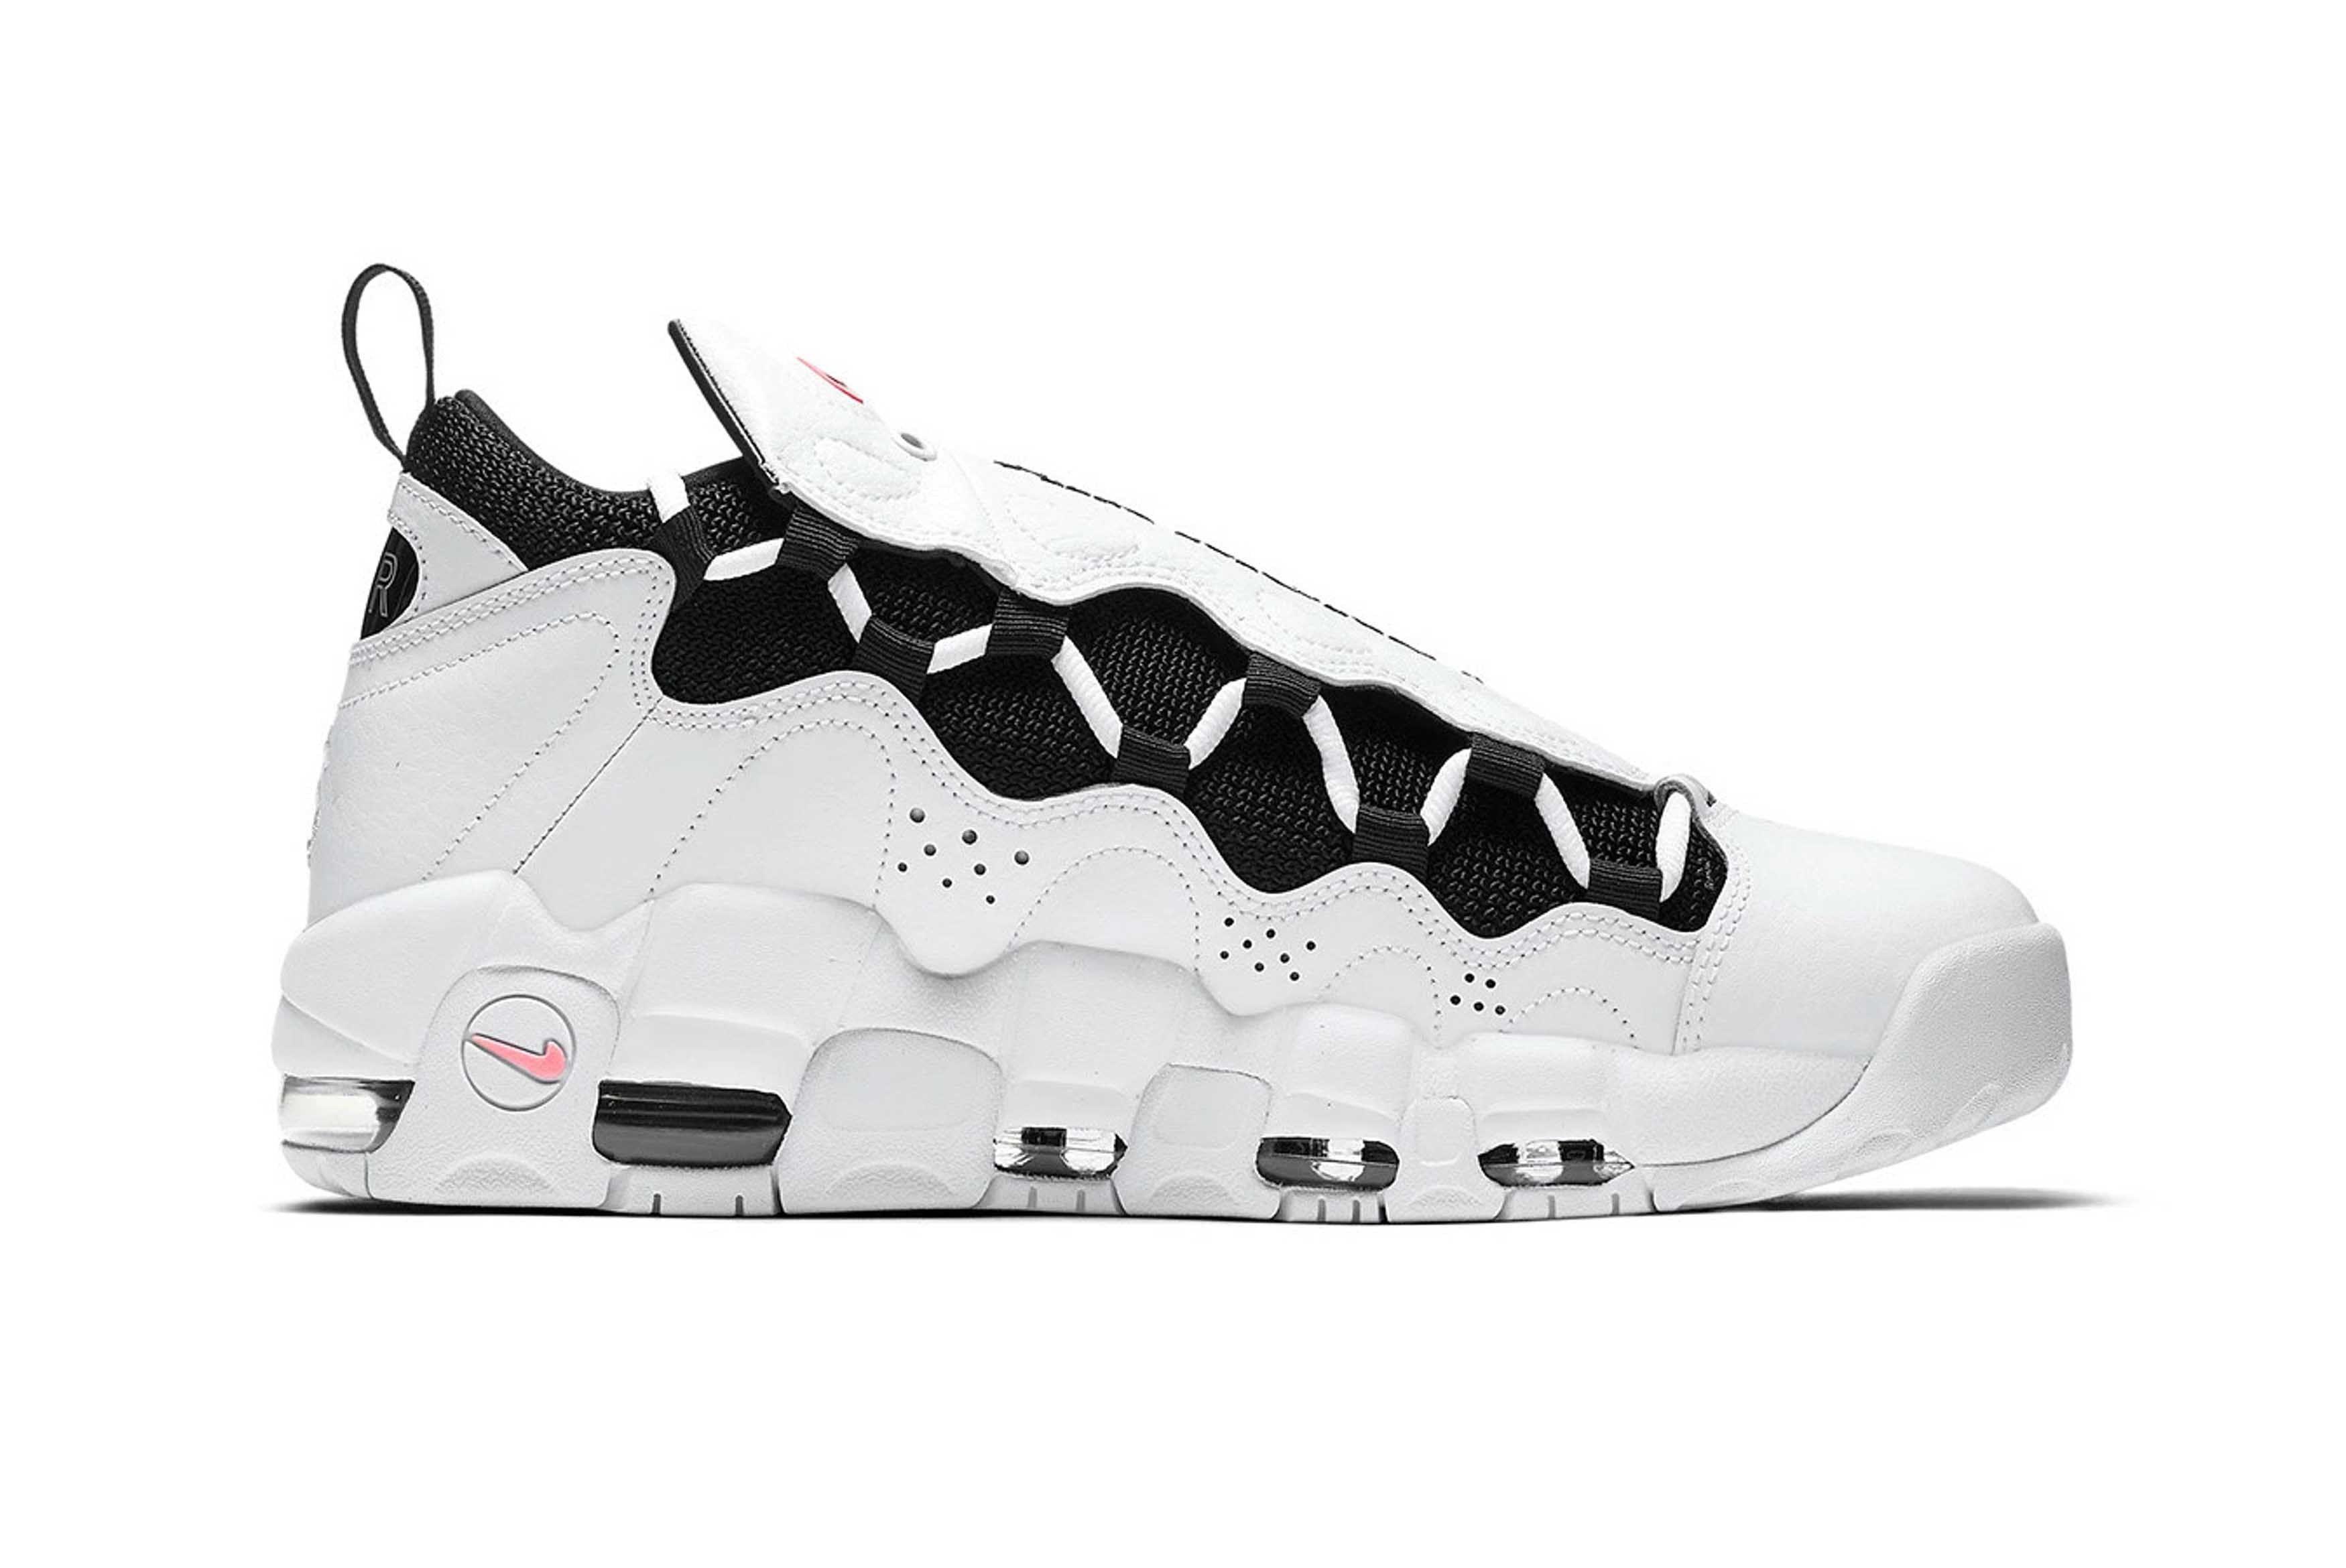 Nike Air More Money Piggy Bank Release Date 3 Sneaker Freaker